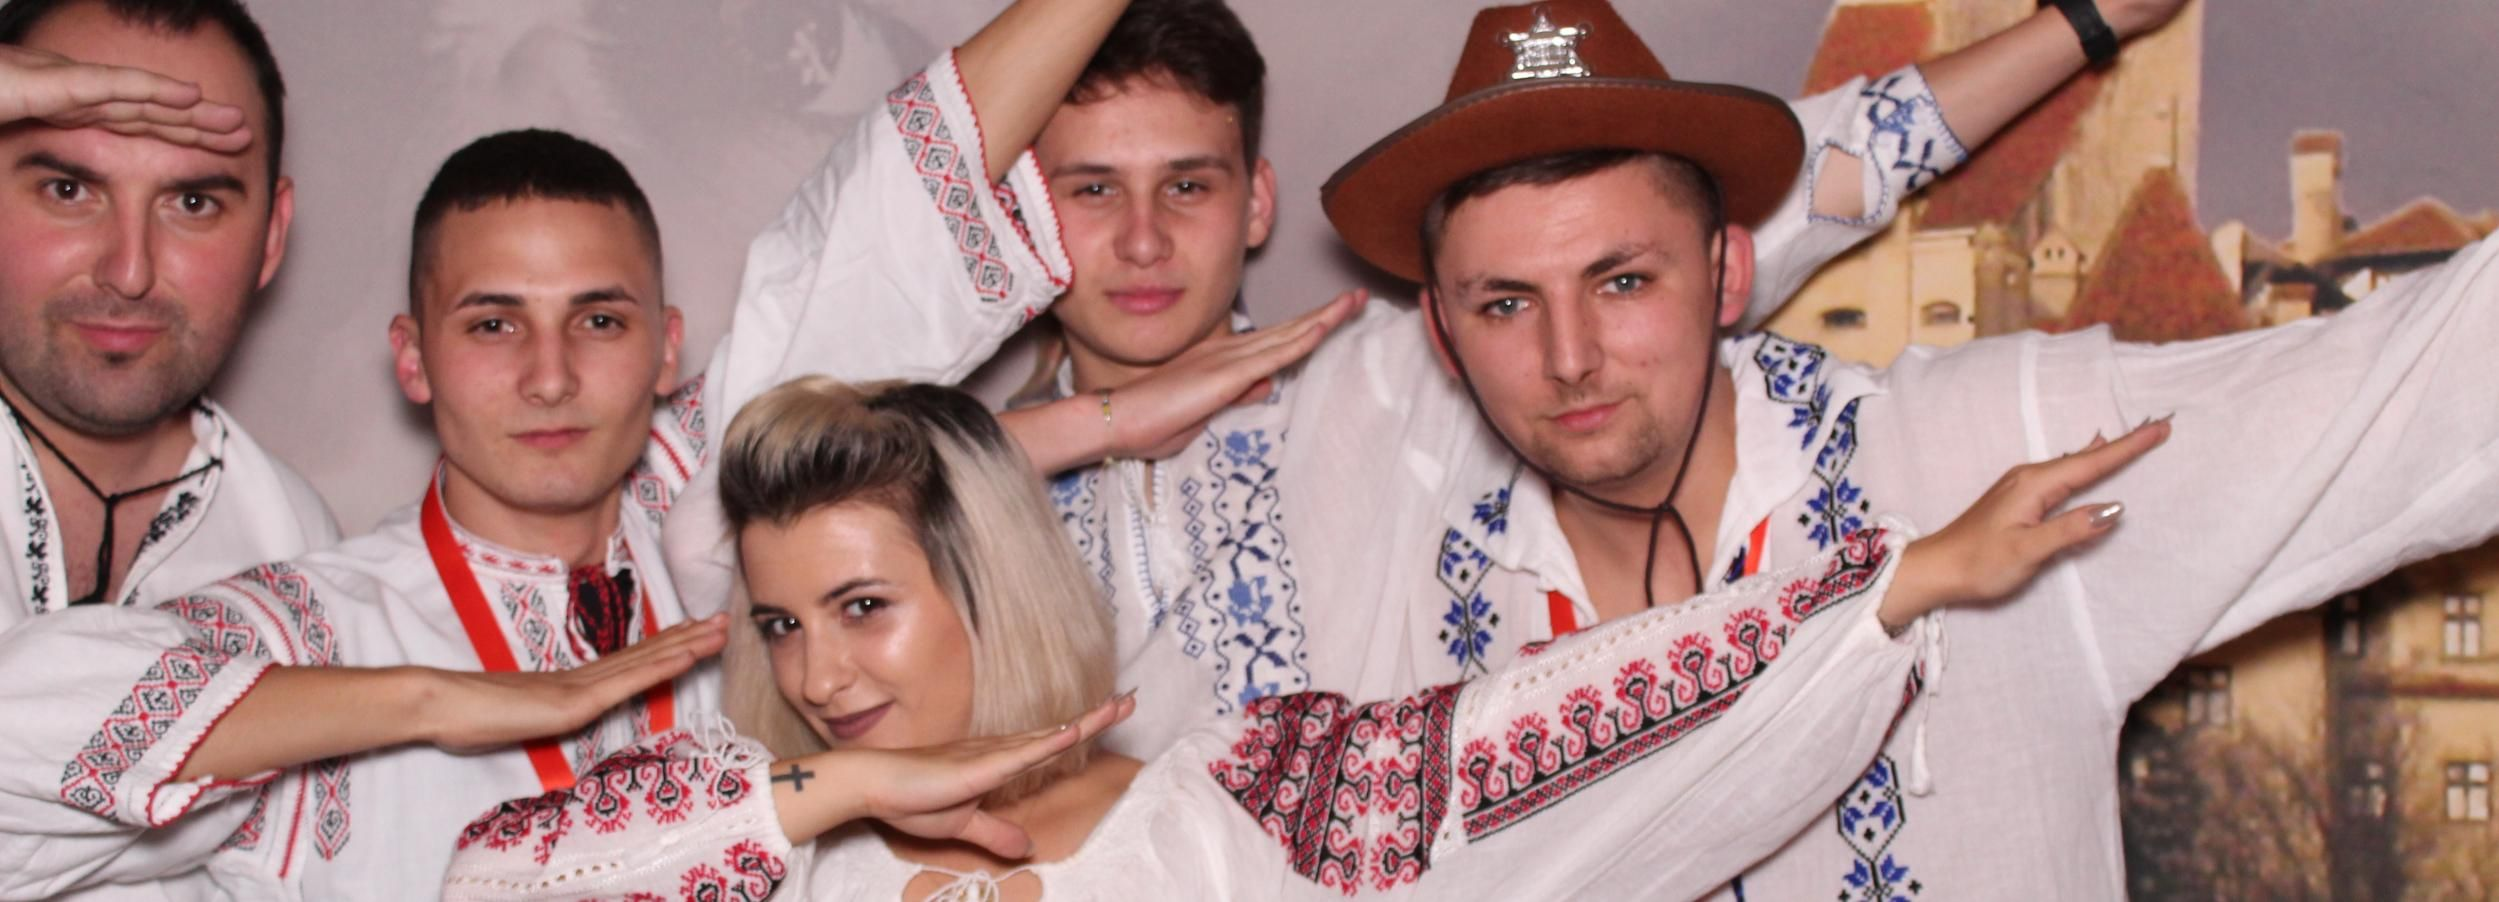 Bucharest: 3-Day Transylvania Halloween Tour